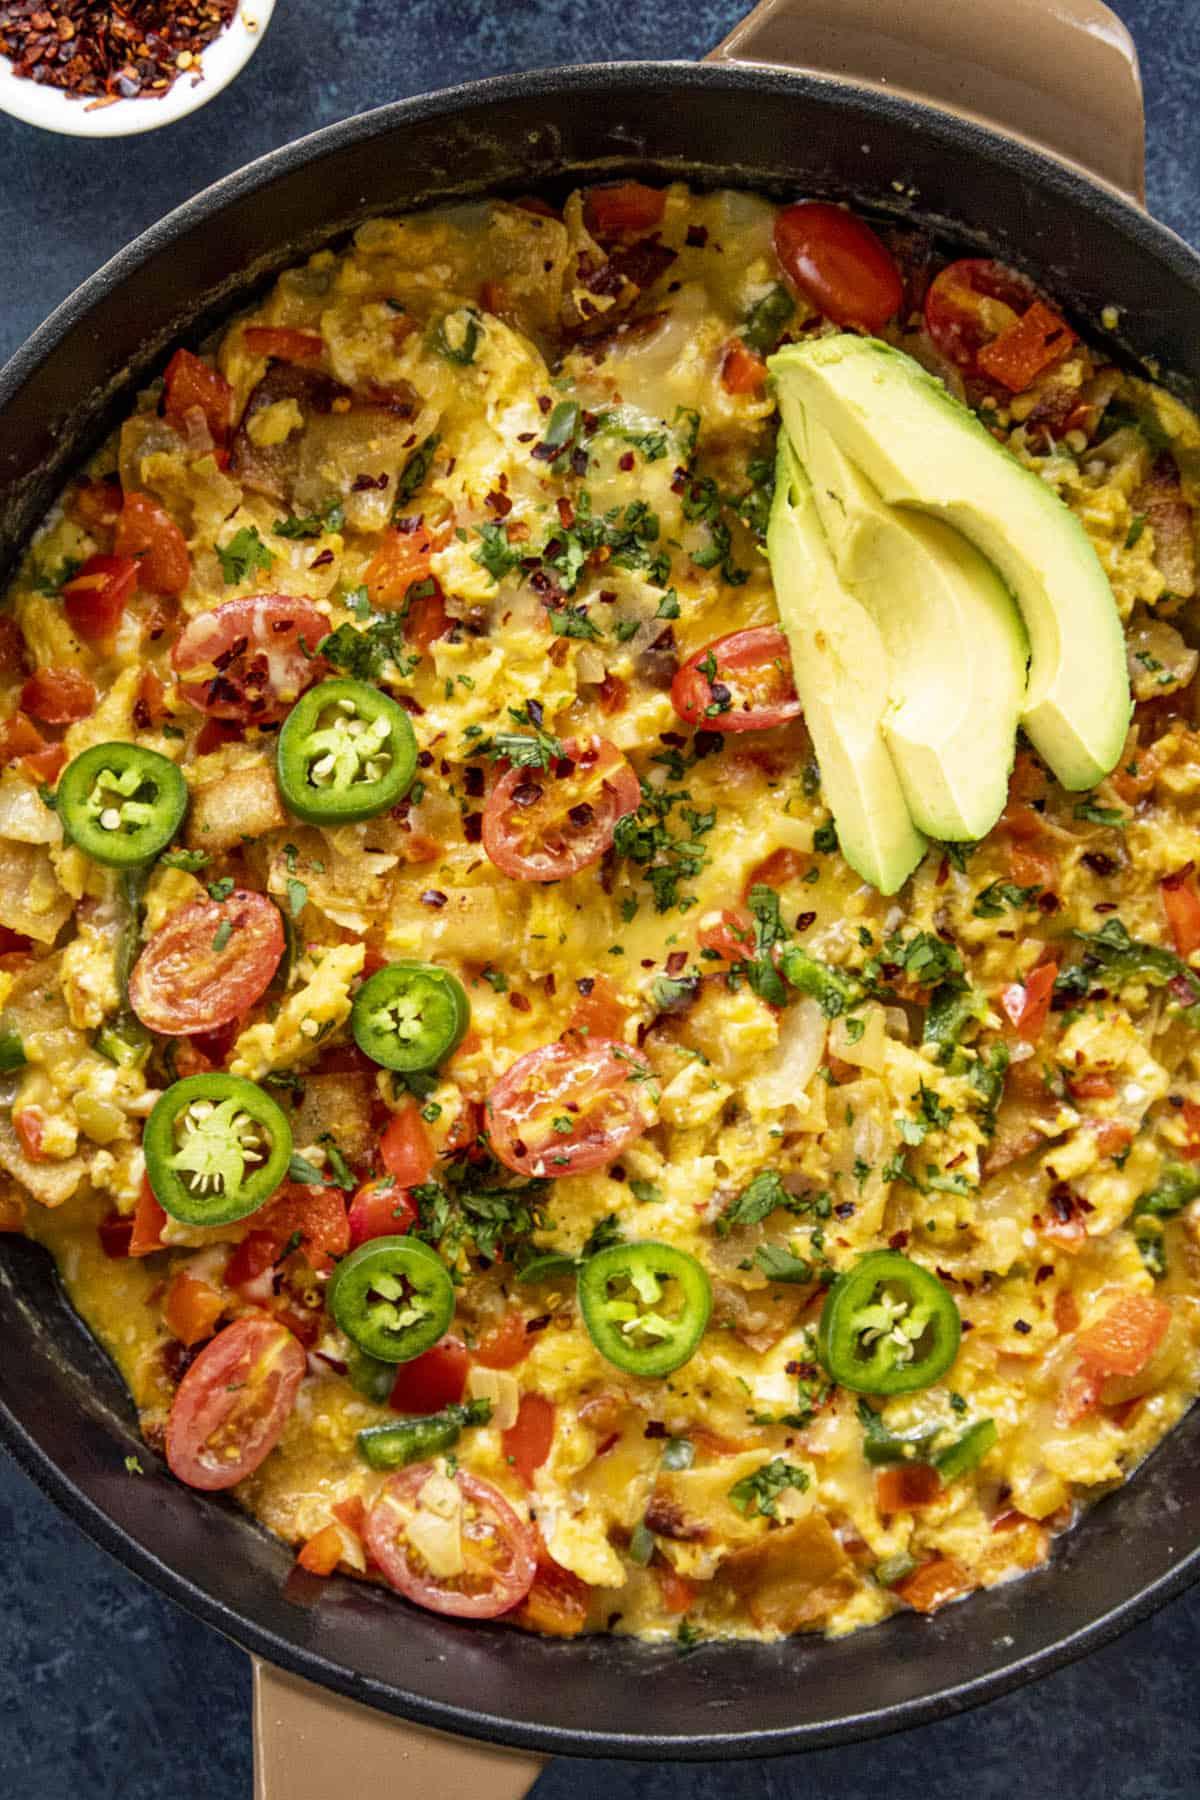 A big pan of Migas (Easy Mexican Scrambled Eggs with Crispy Tortillas)